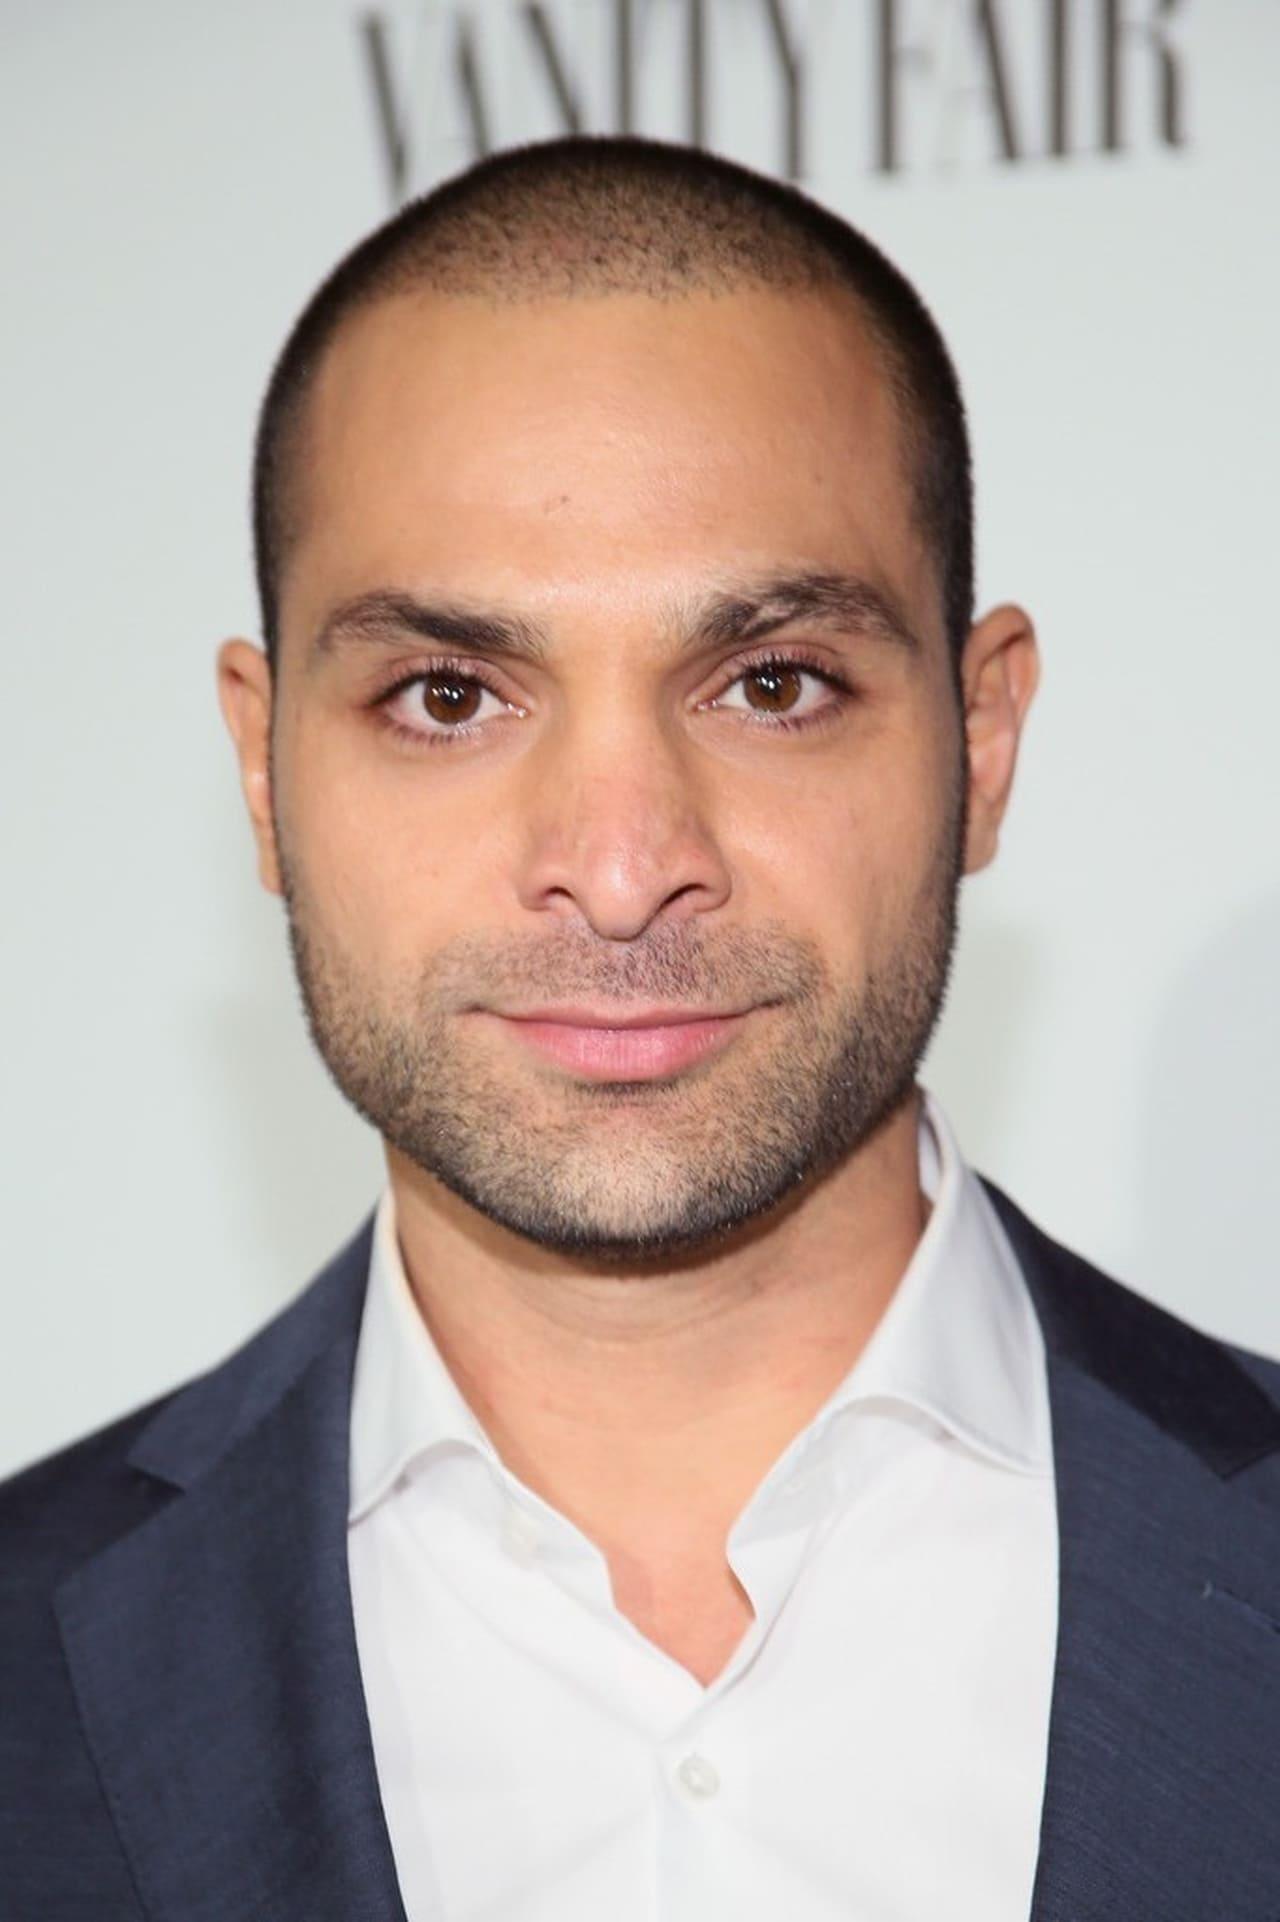 Michael Mando isMark Vega